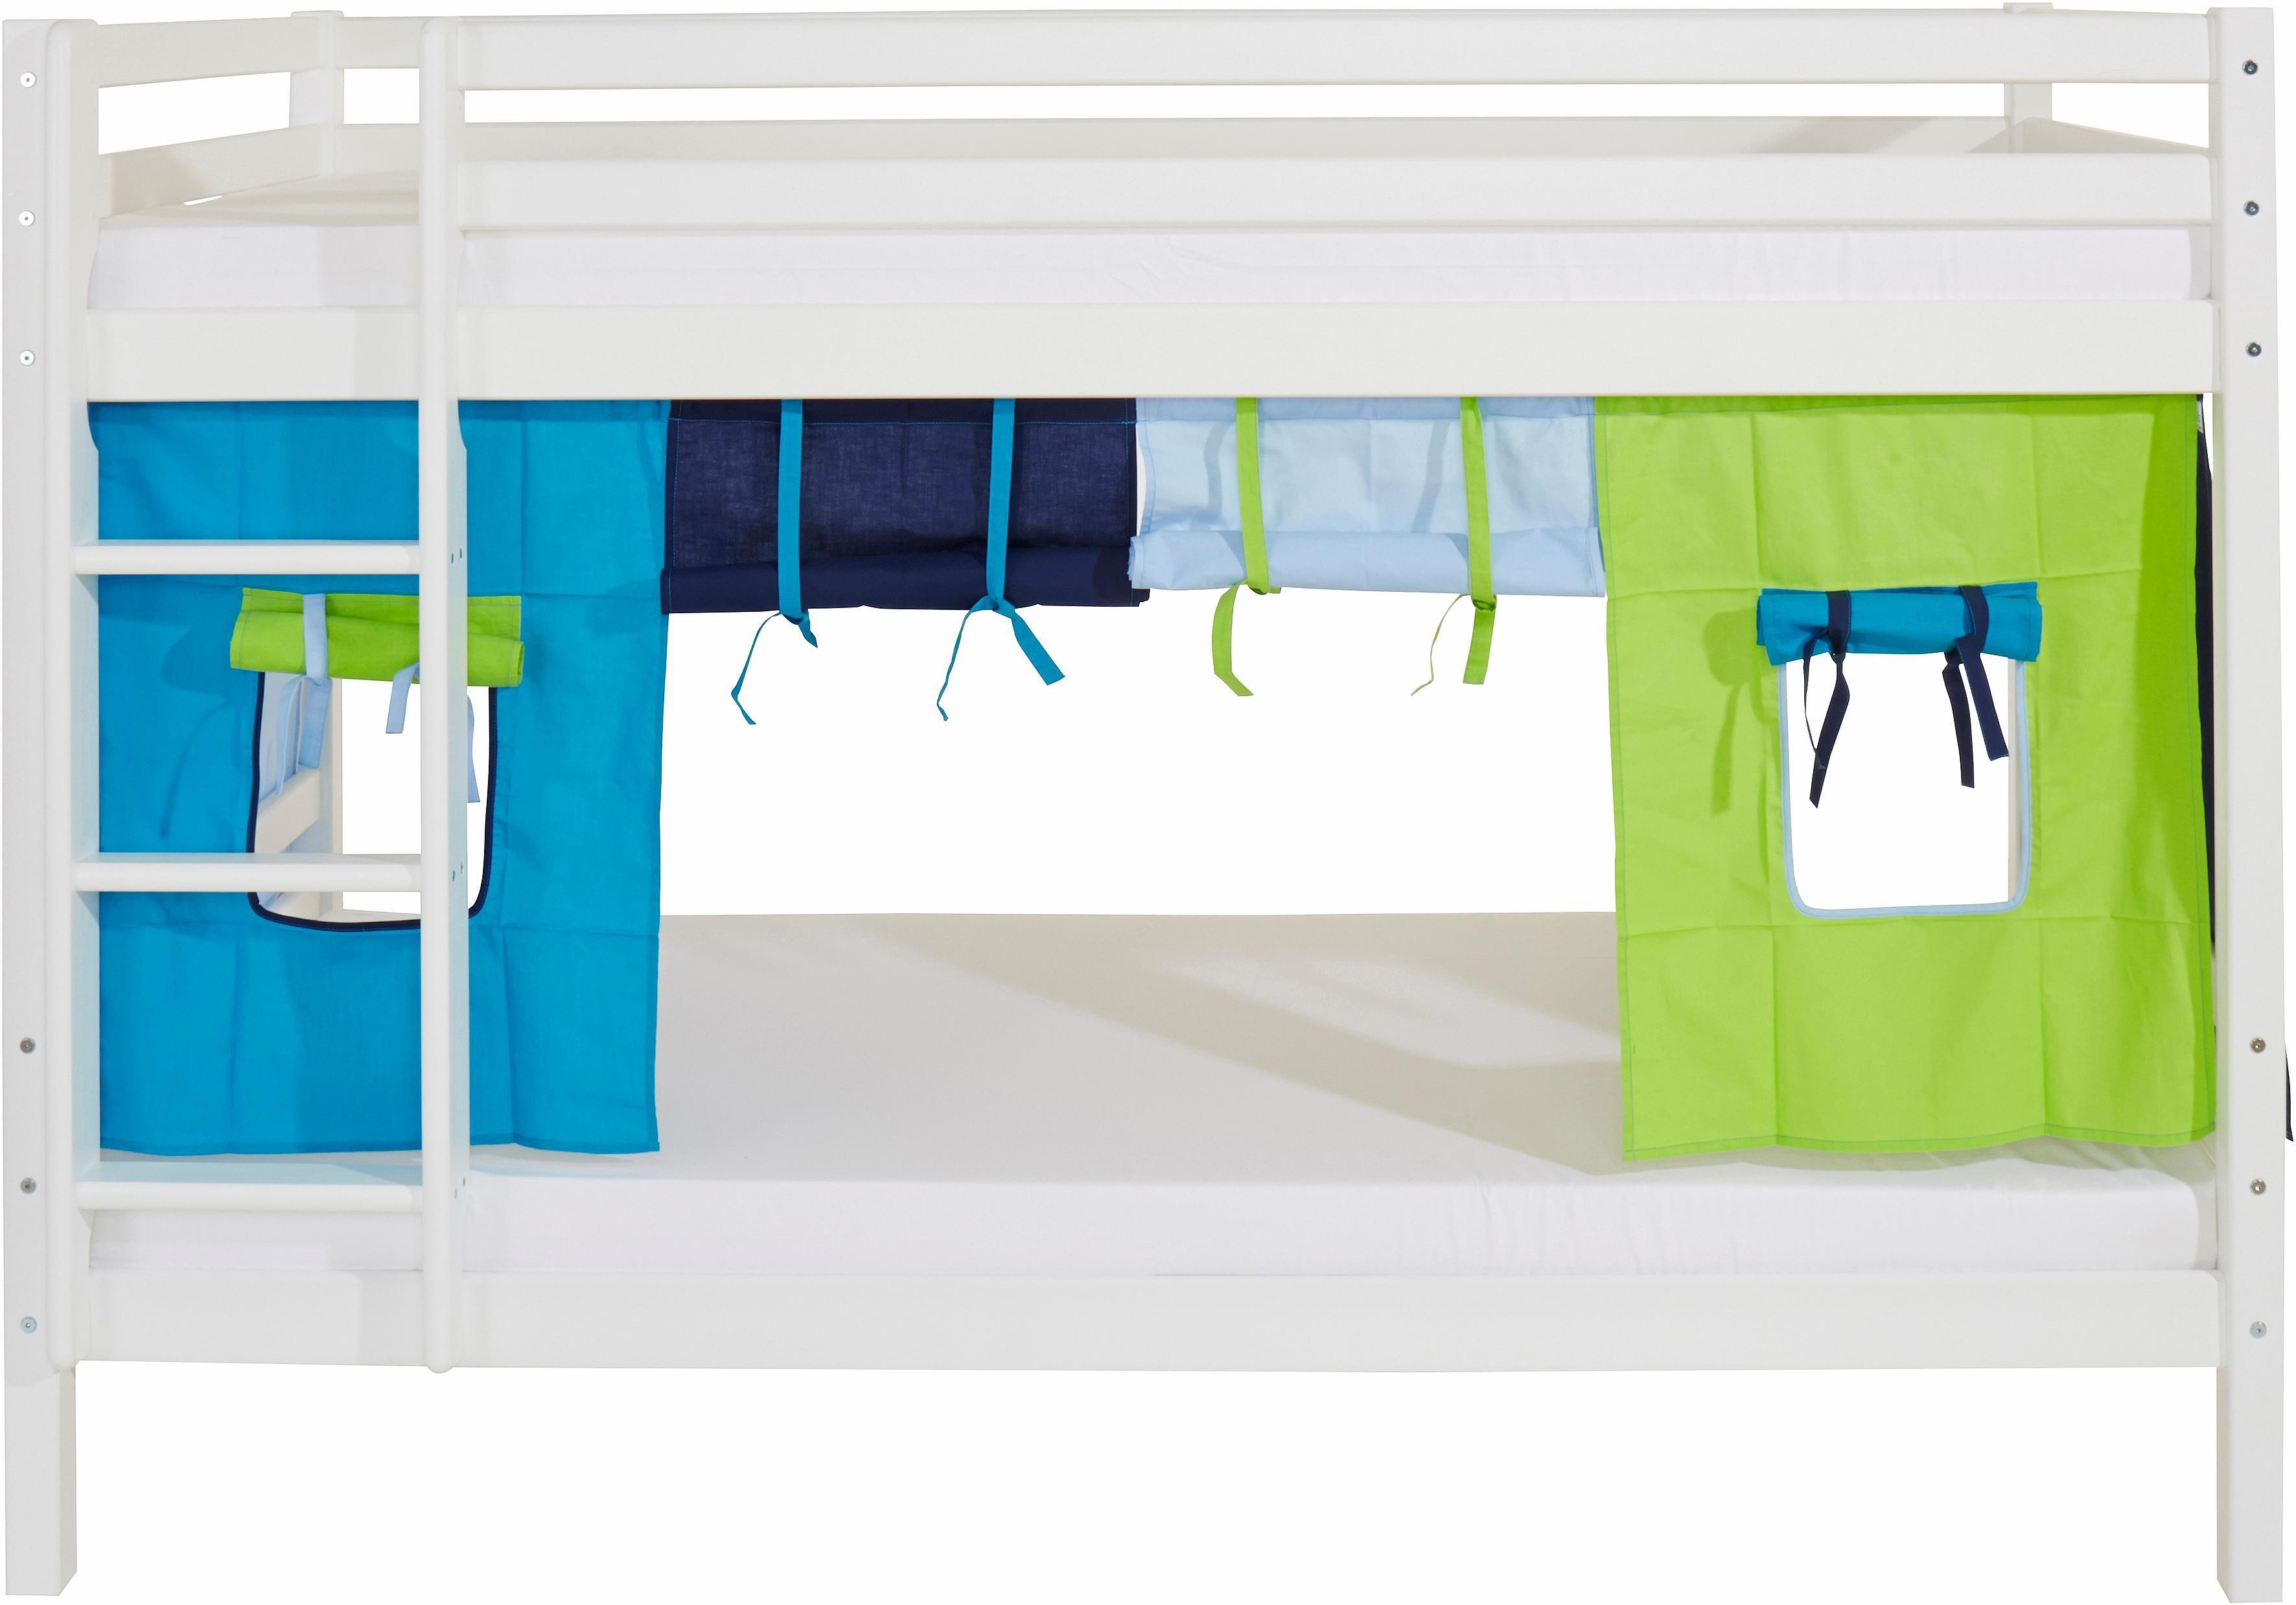 Hoppekids Etagenbett »Multicolor« | Kinderzimmer > Kinderbetten > Etagenbetten | Weiß - Blau | Massiver - Stoff | Hoppekids